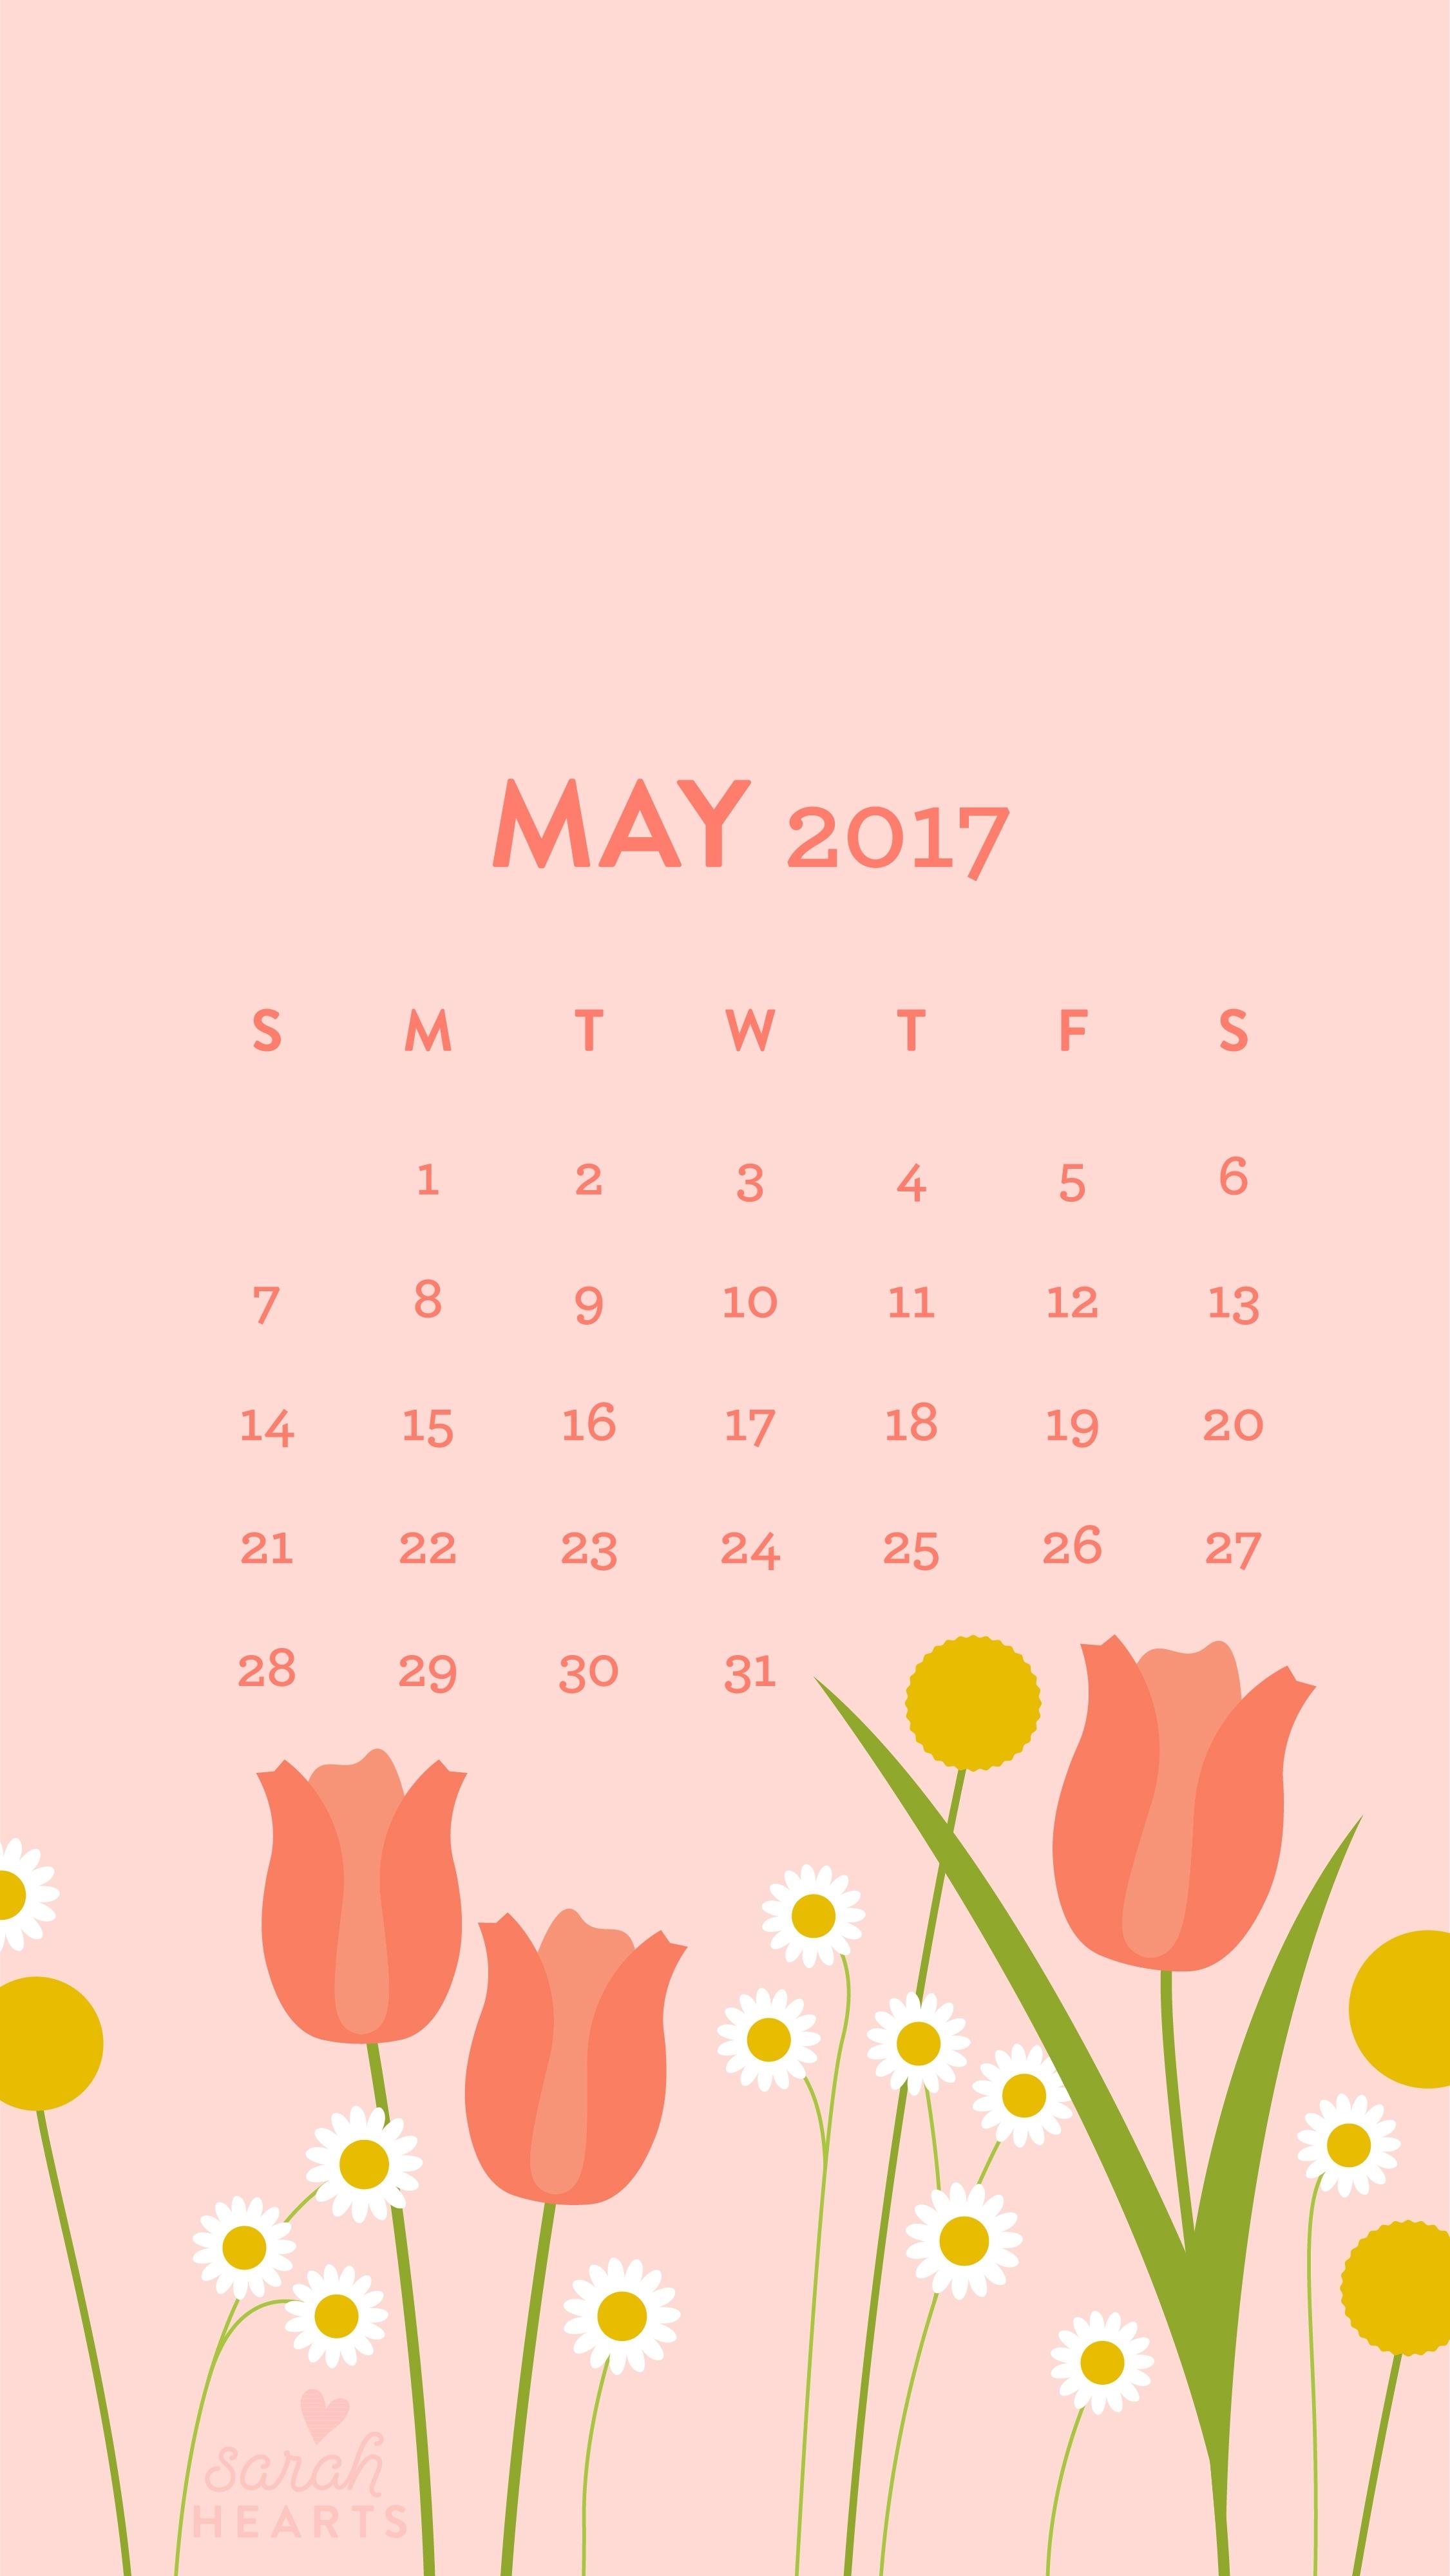 may 2017 calendar wallpaper - sarah hearts